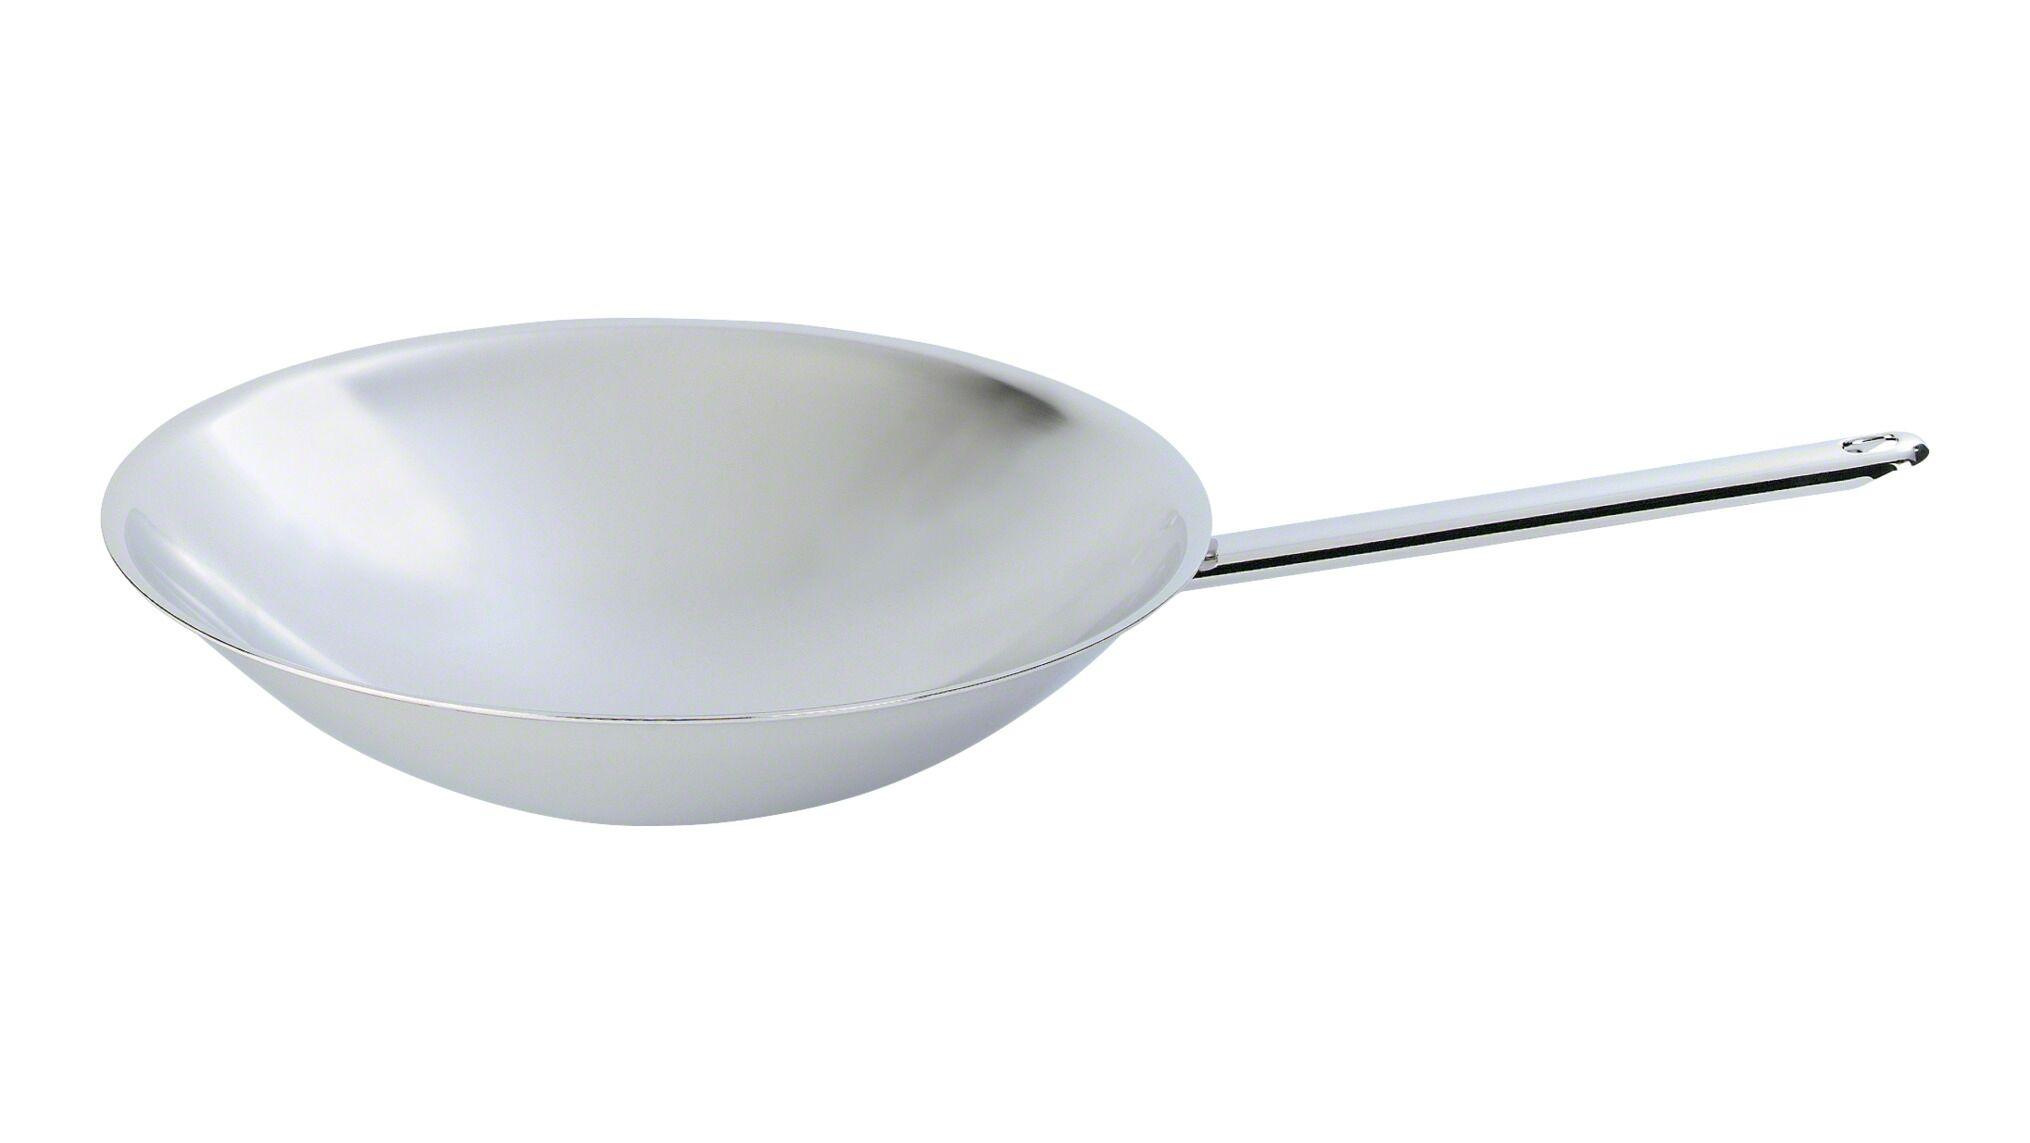 Demeyere Klassisk wok i rustfrit stål, Wok, 36 cm